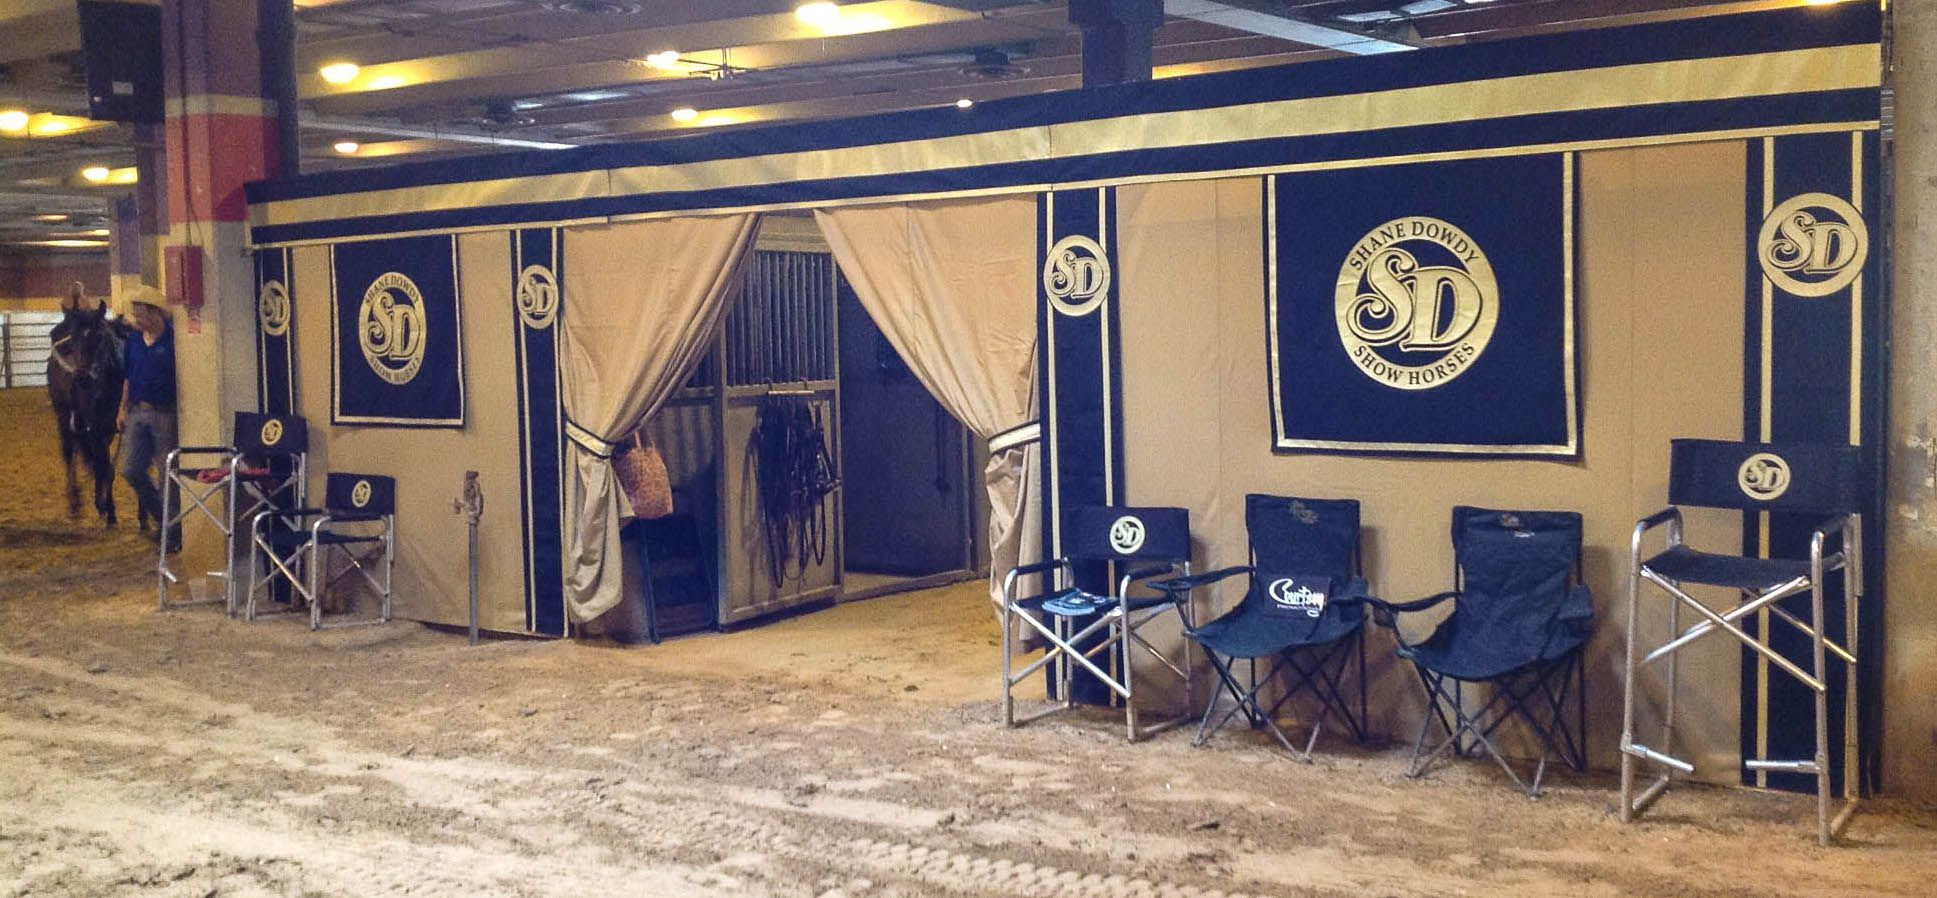 Shane Dowdy Show Horses Horse Stall Decorations Horse Stalls Show Horses